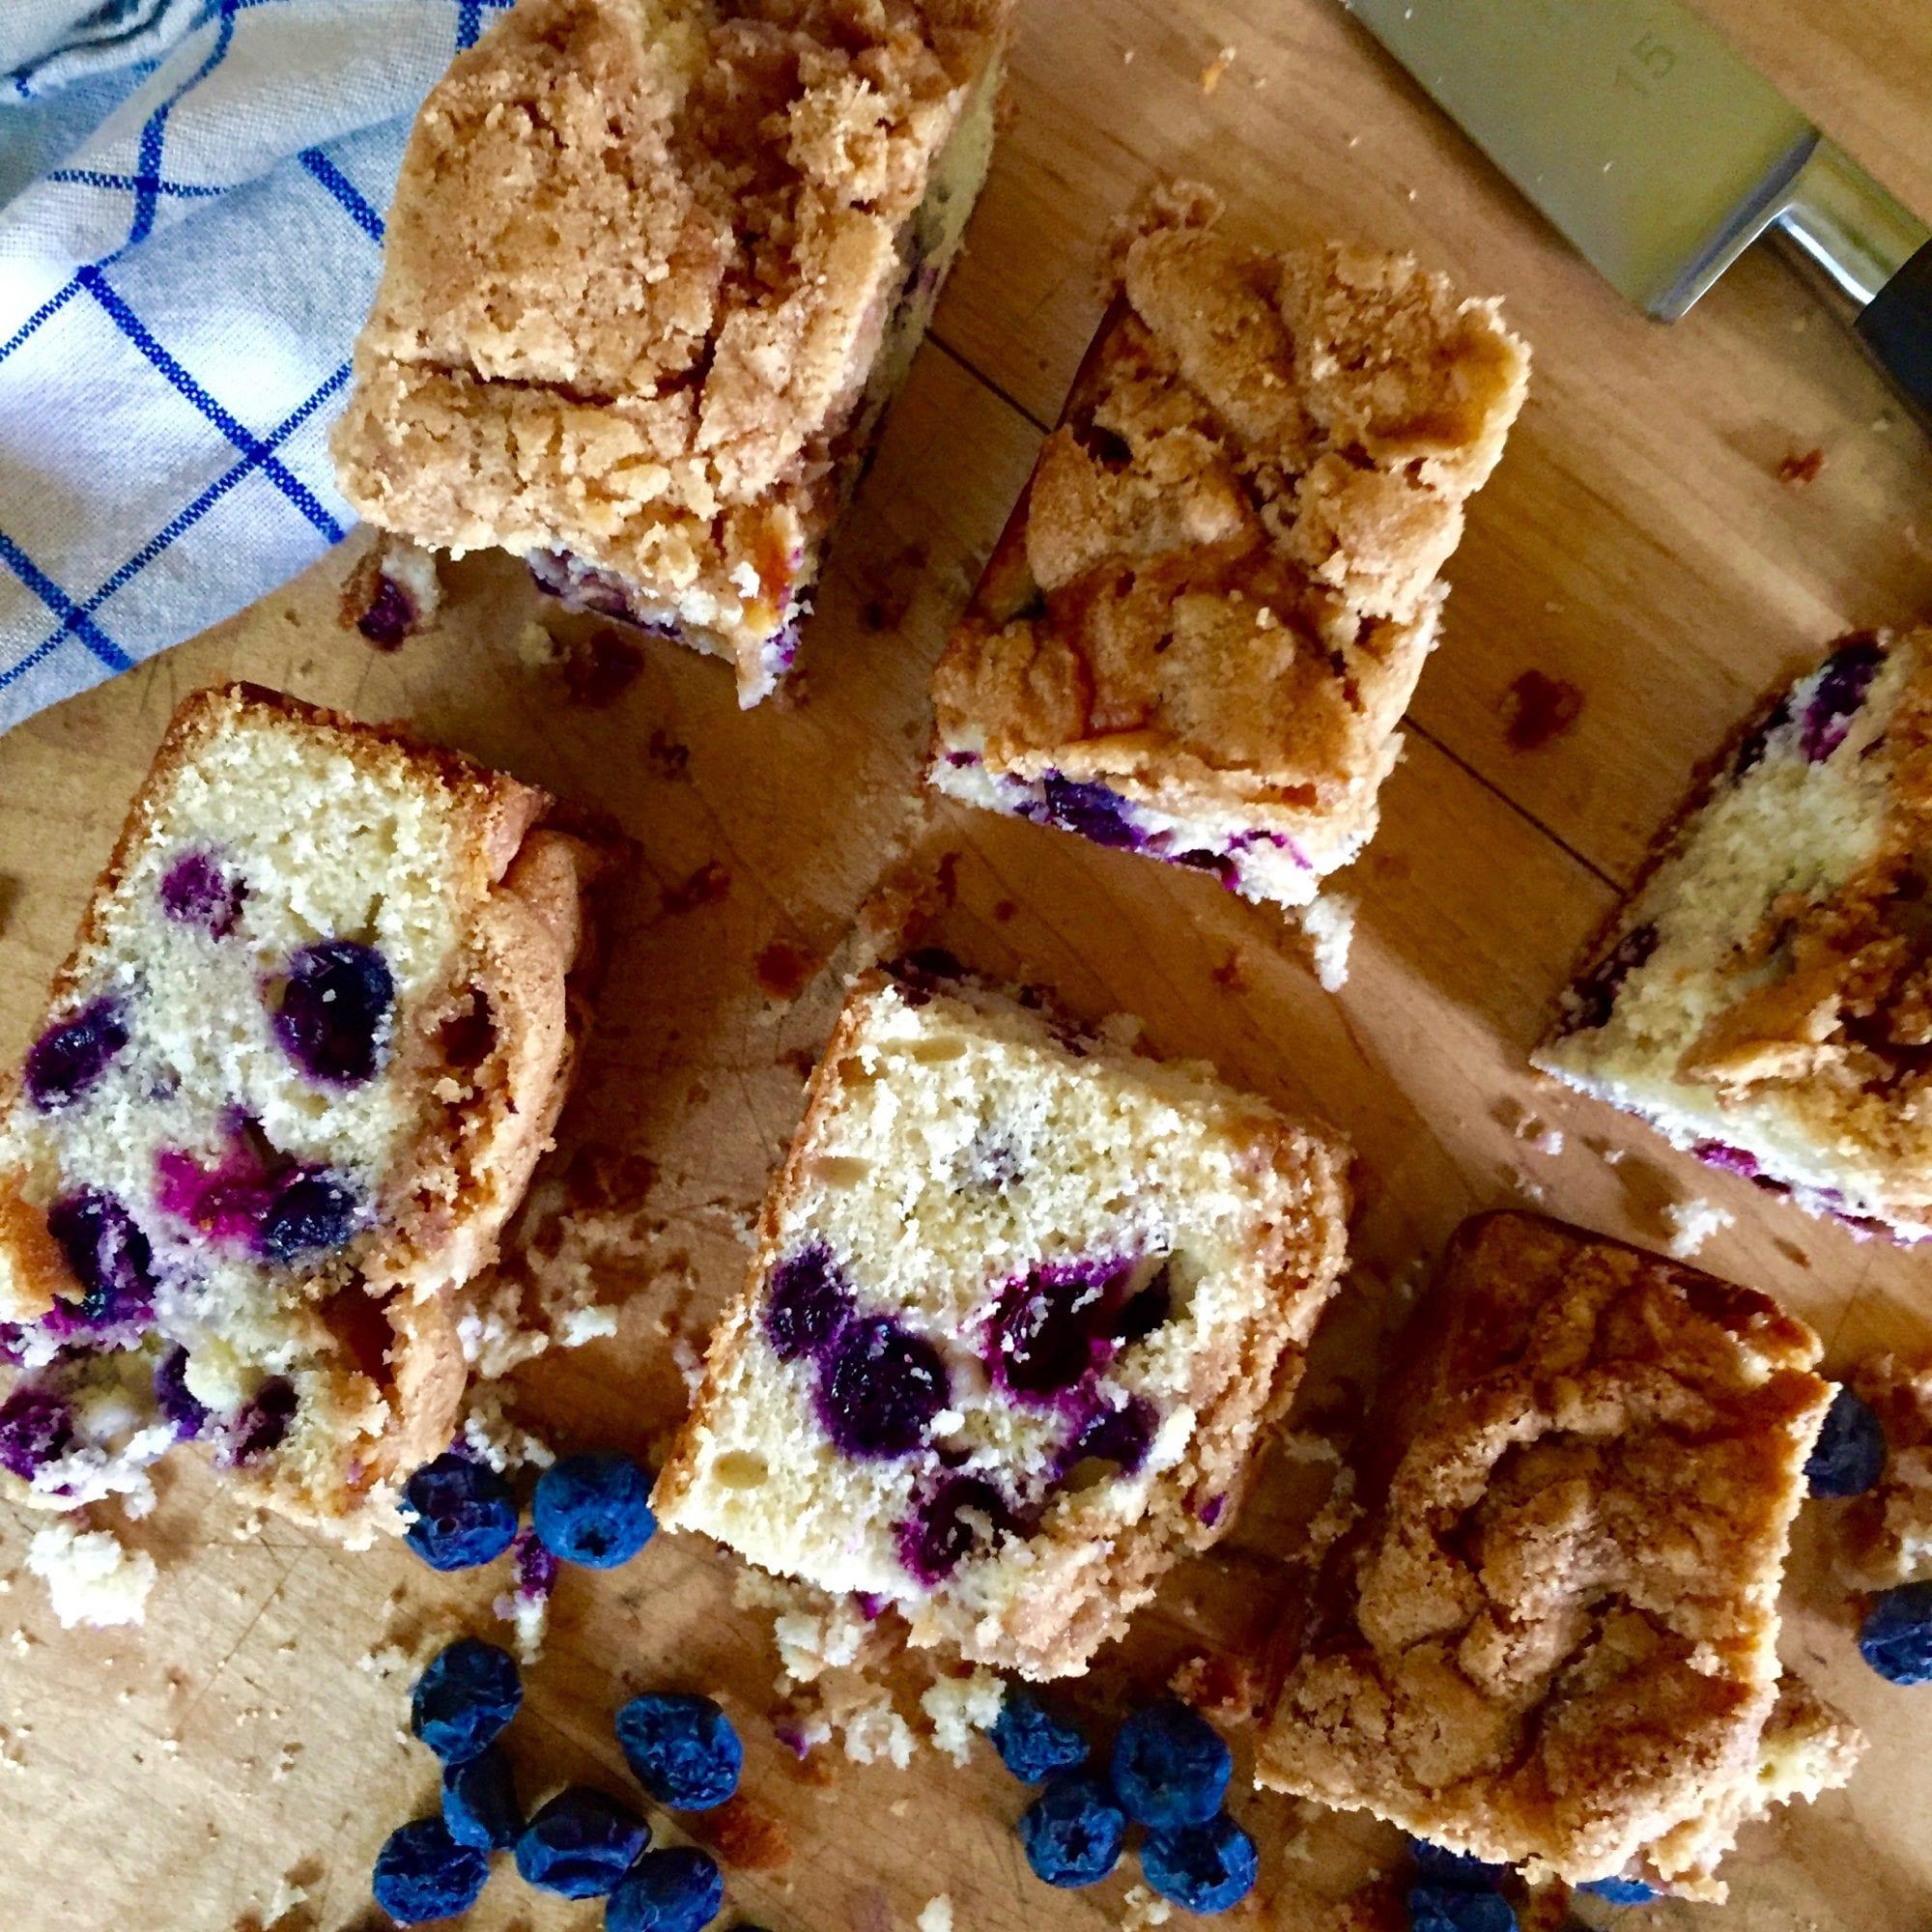 Blueberry Buttermilk Snack Cake – Jessie Sheehan Bakes